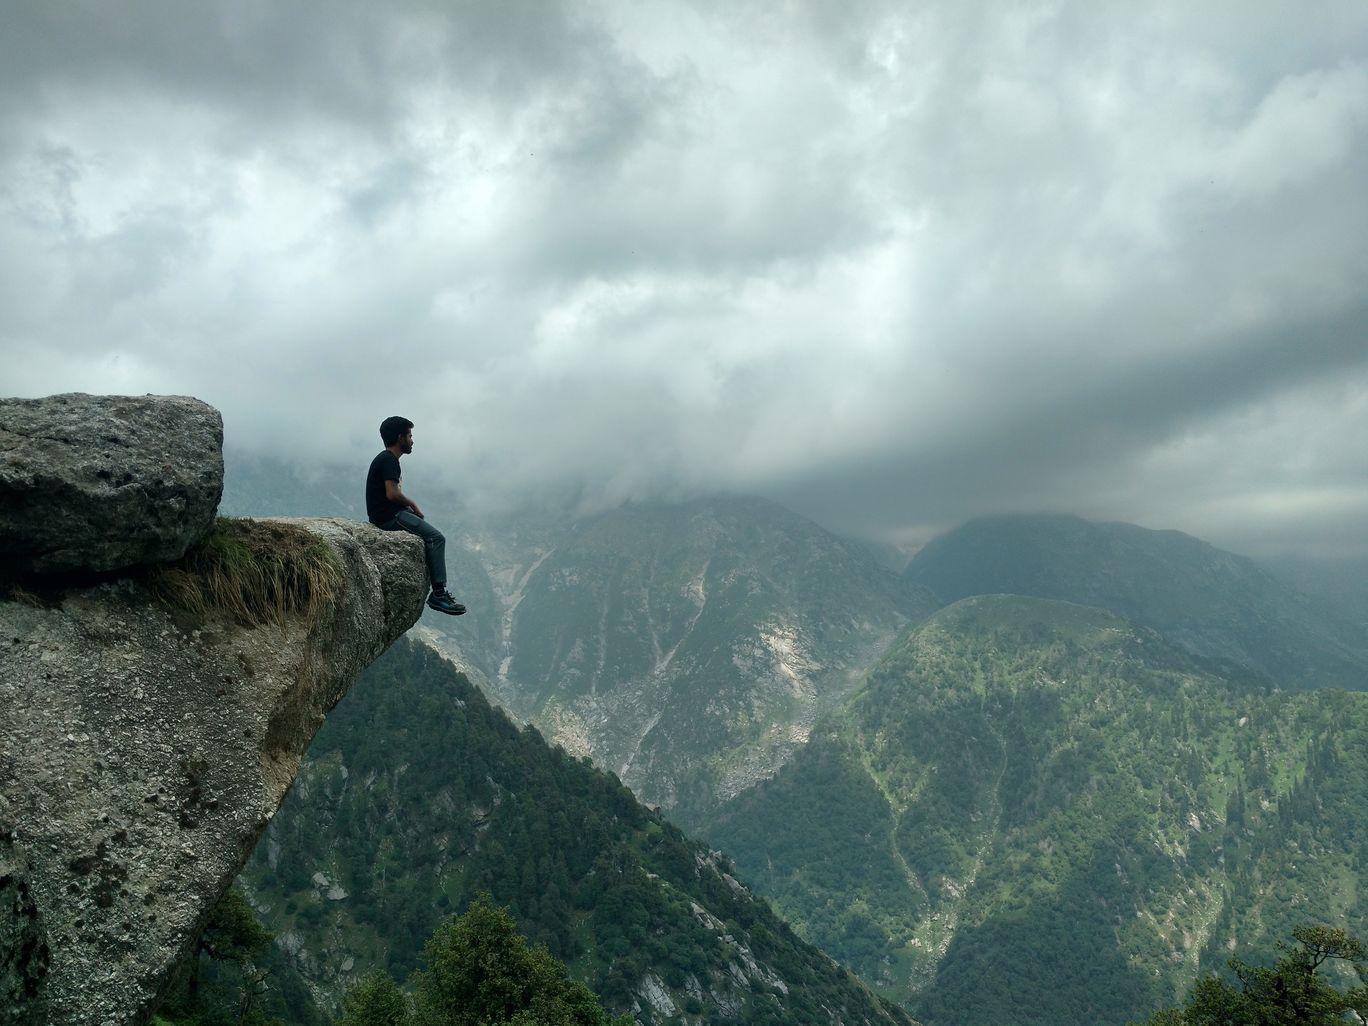 Photo of Triund Trek By akhil ratra